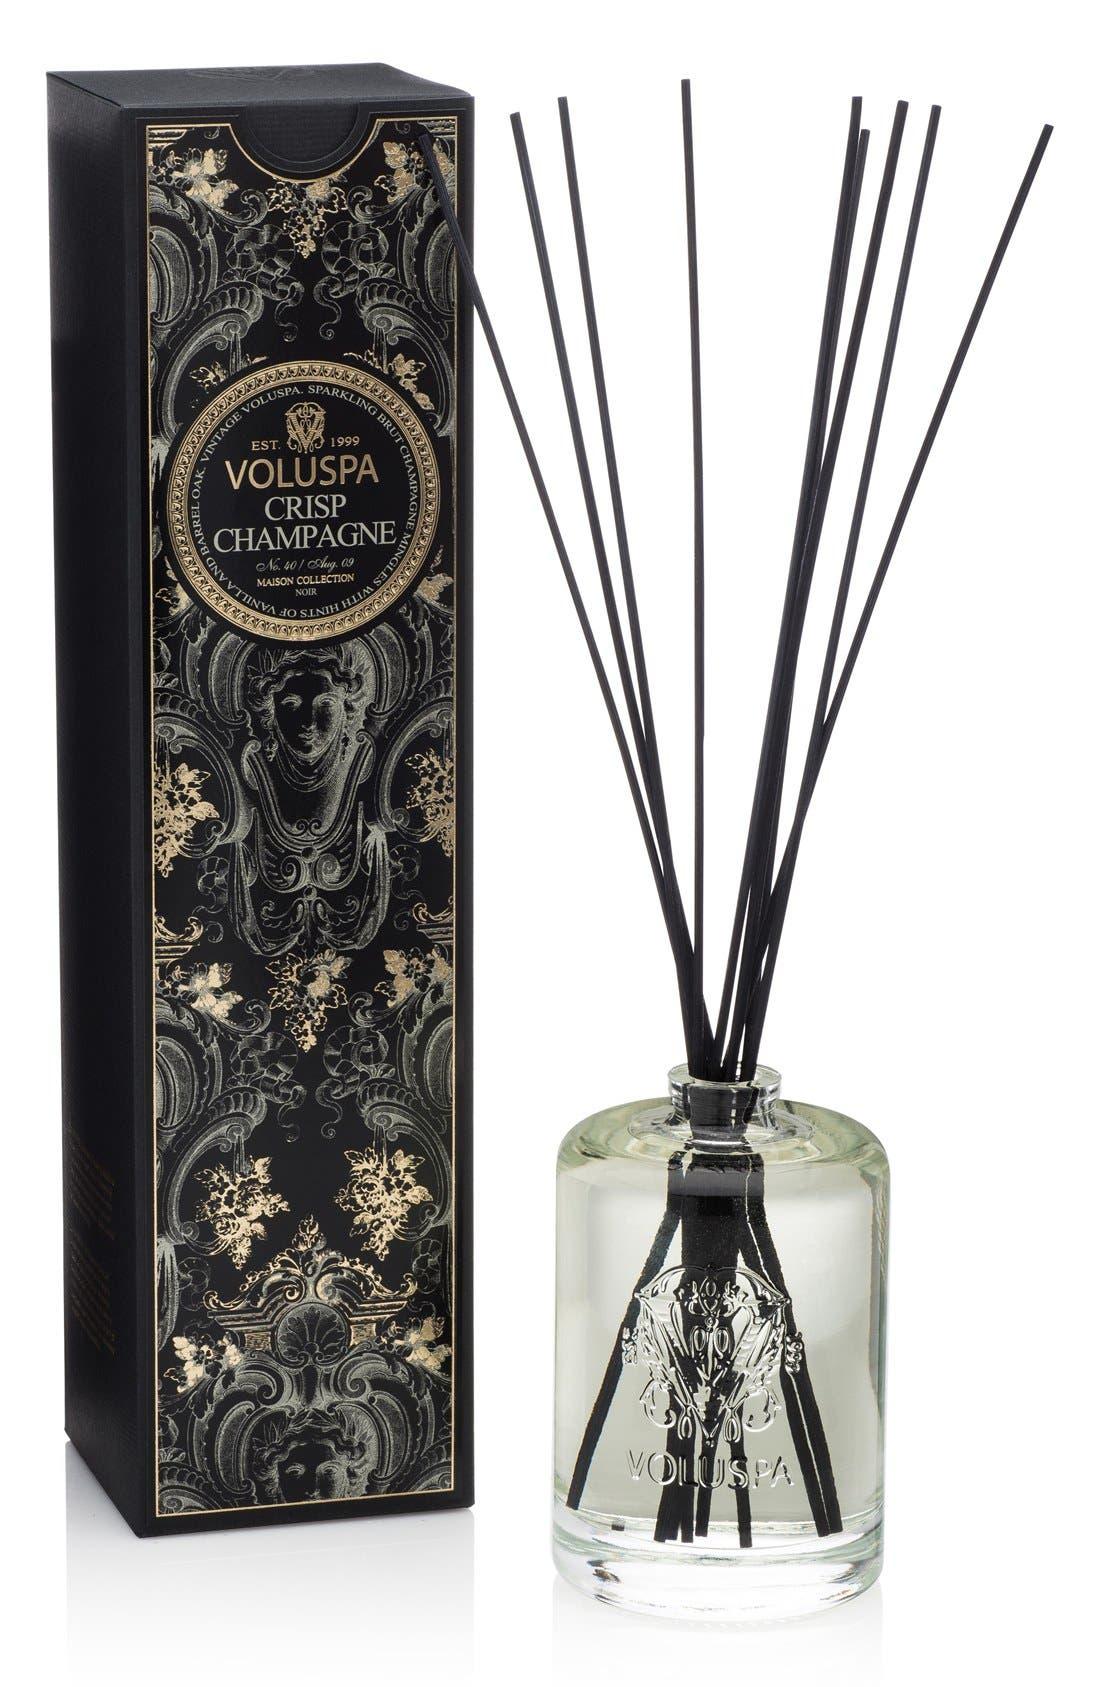 Voluspa 'Maison Blanc - Crisp Champagne' Home Ambience Diffuser